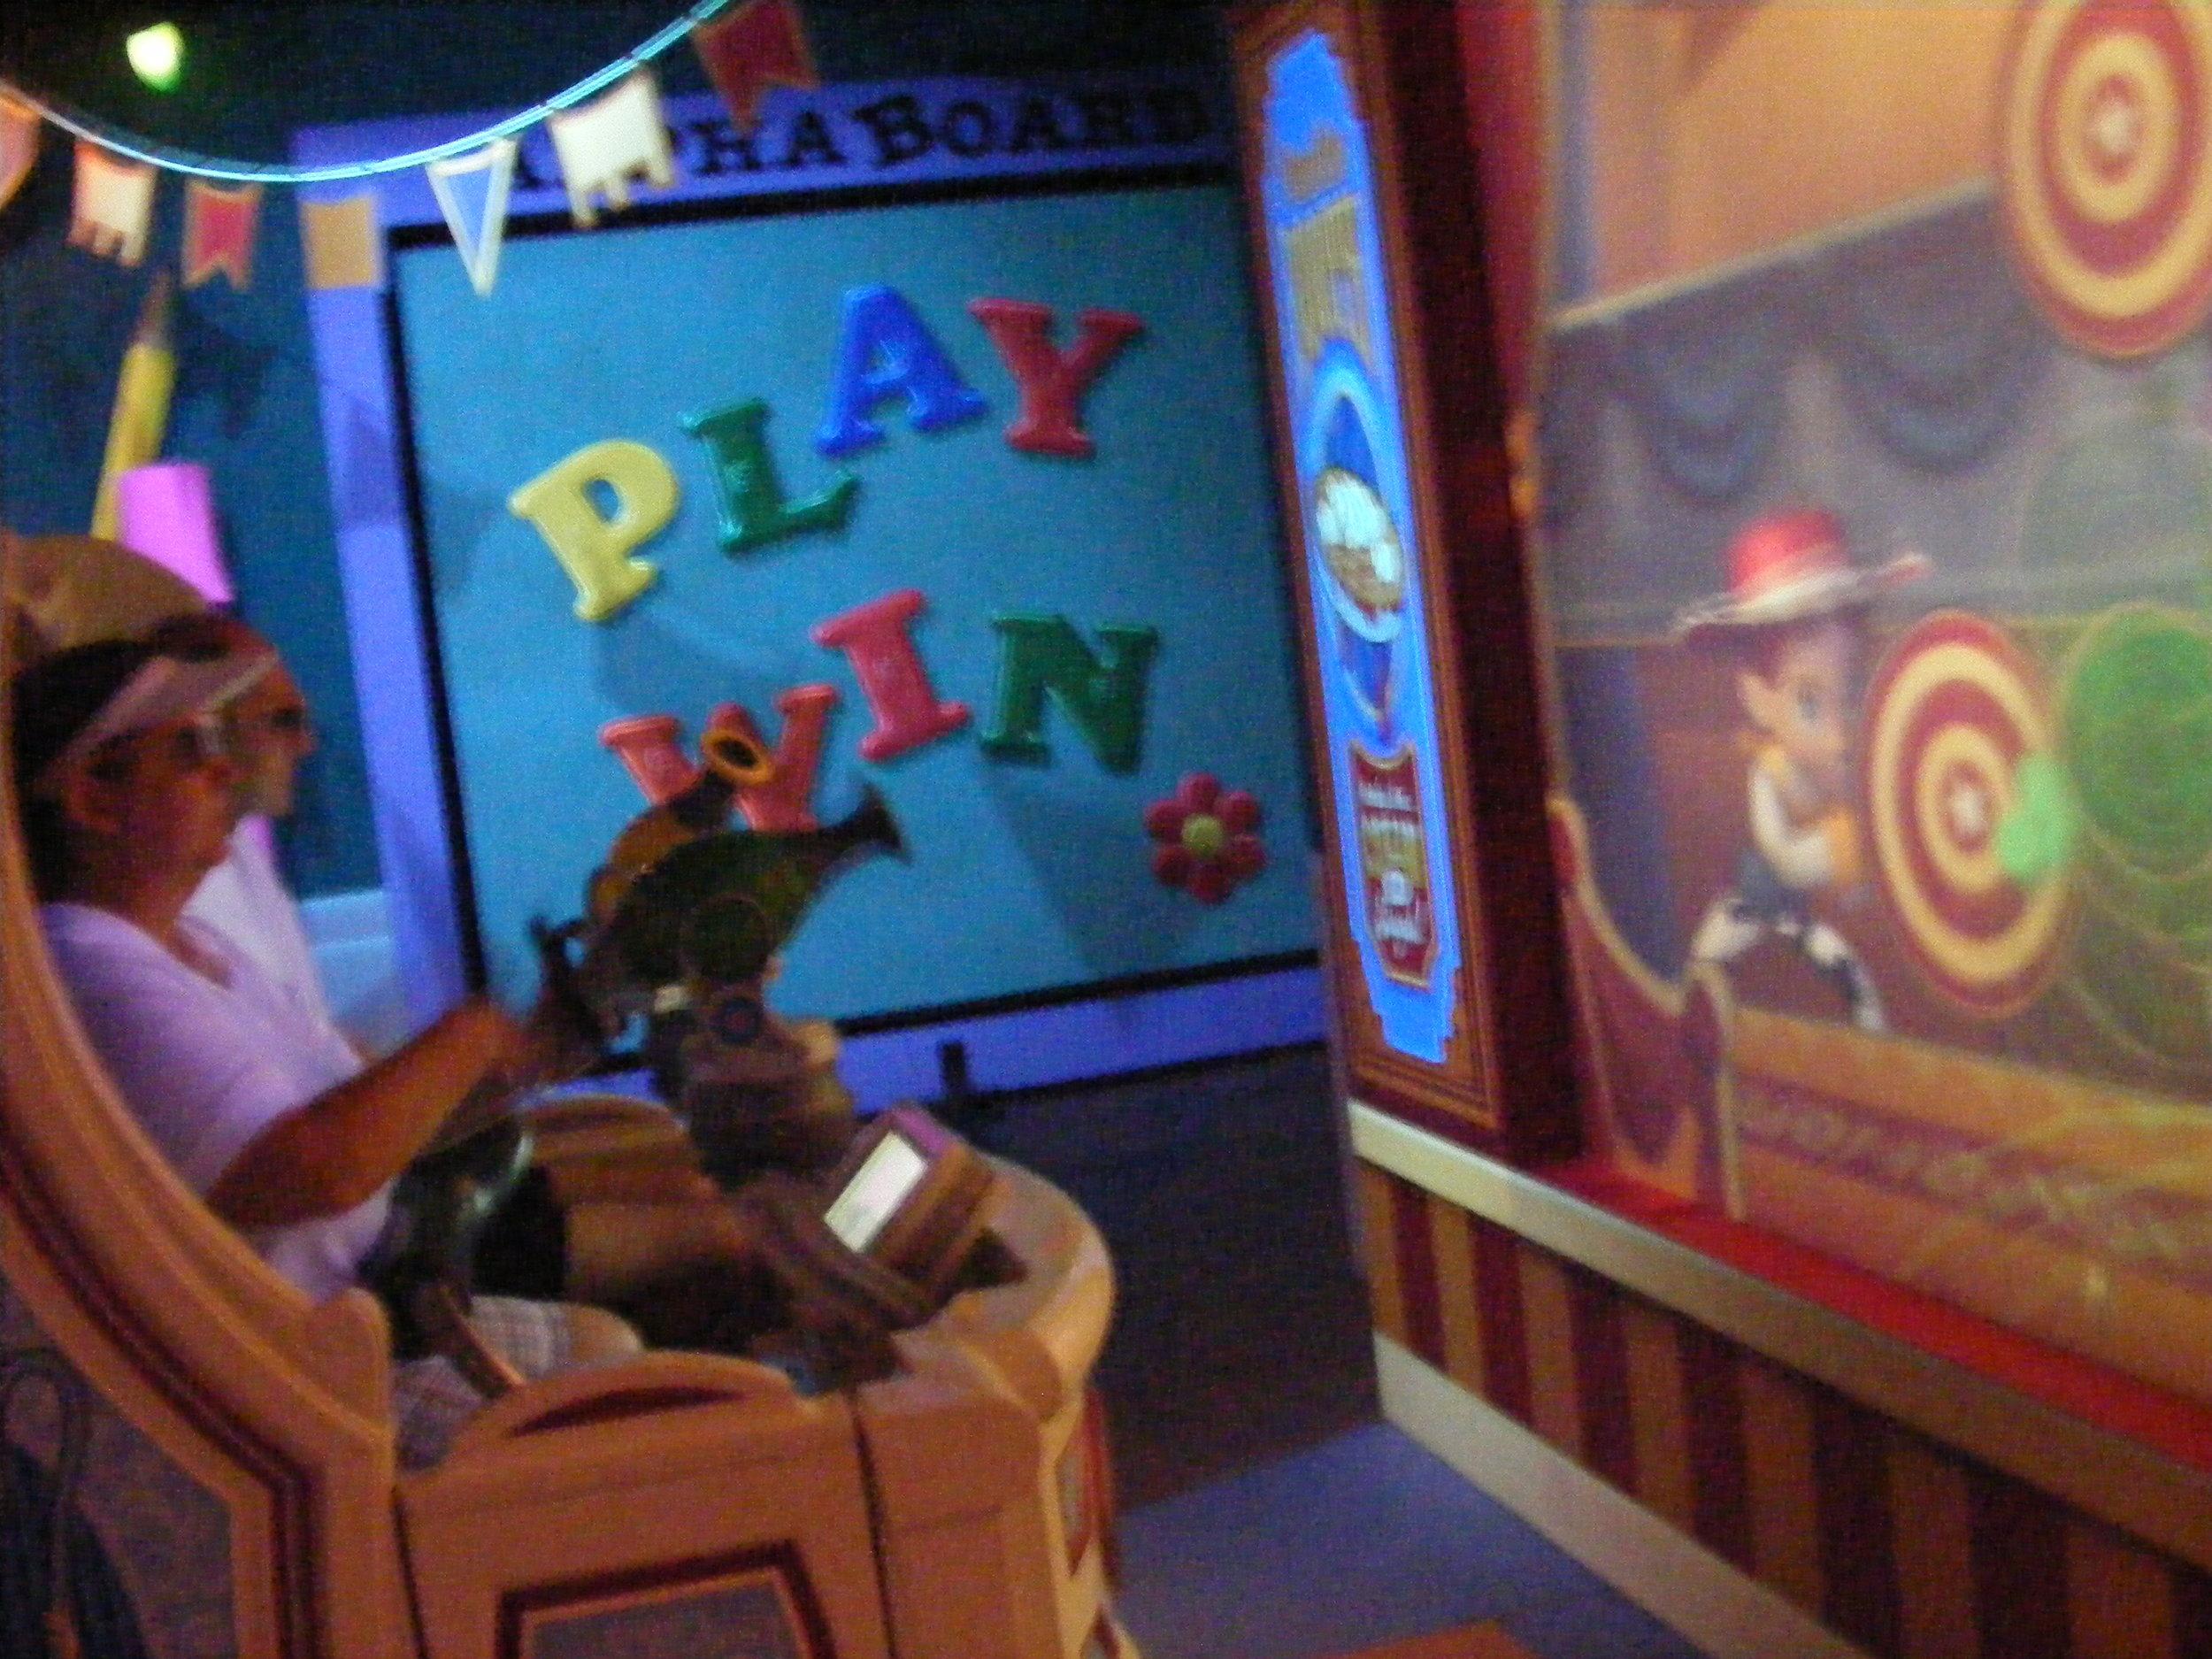 Toy Story Mania, Toy Story Land, Disney's Hollywood Studios